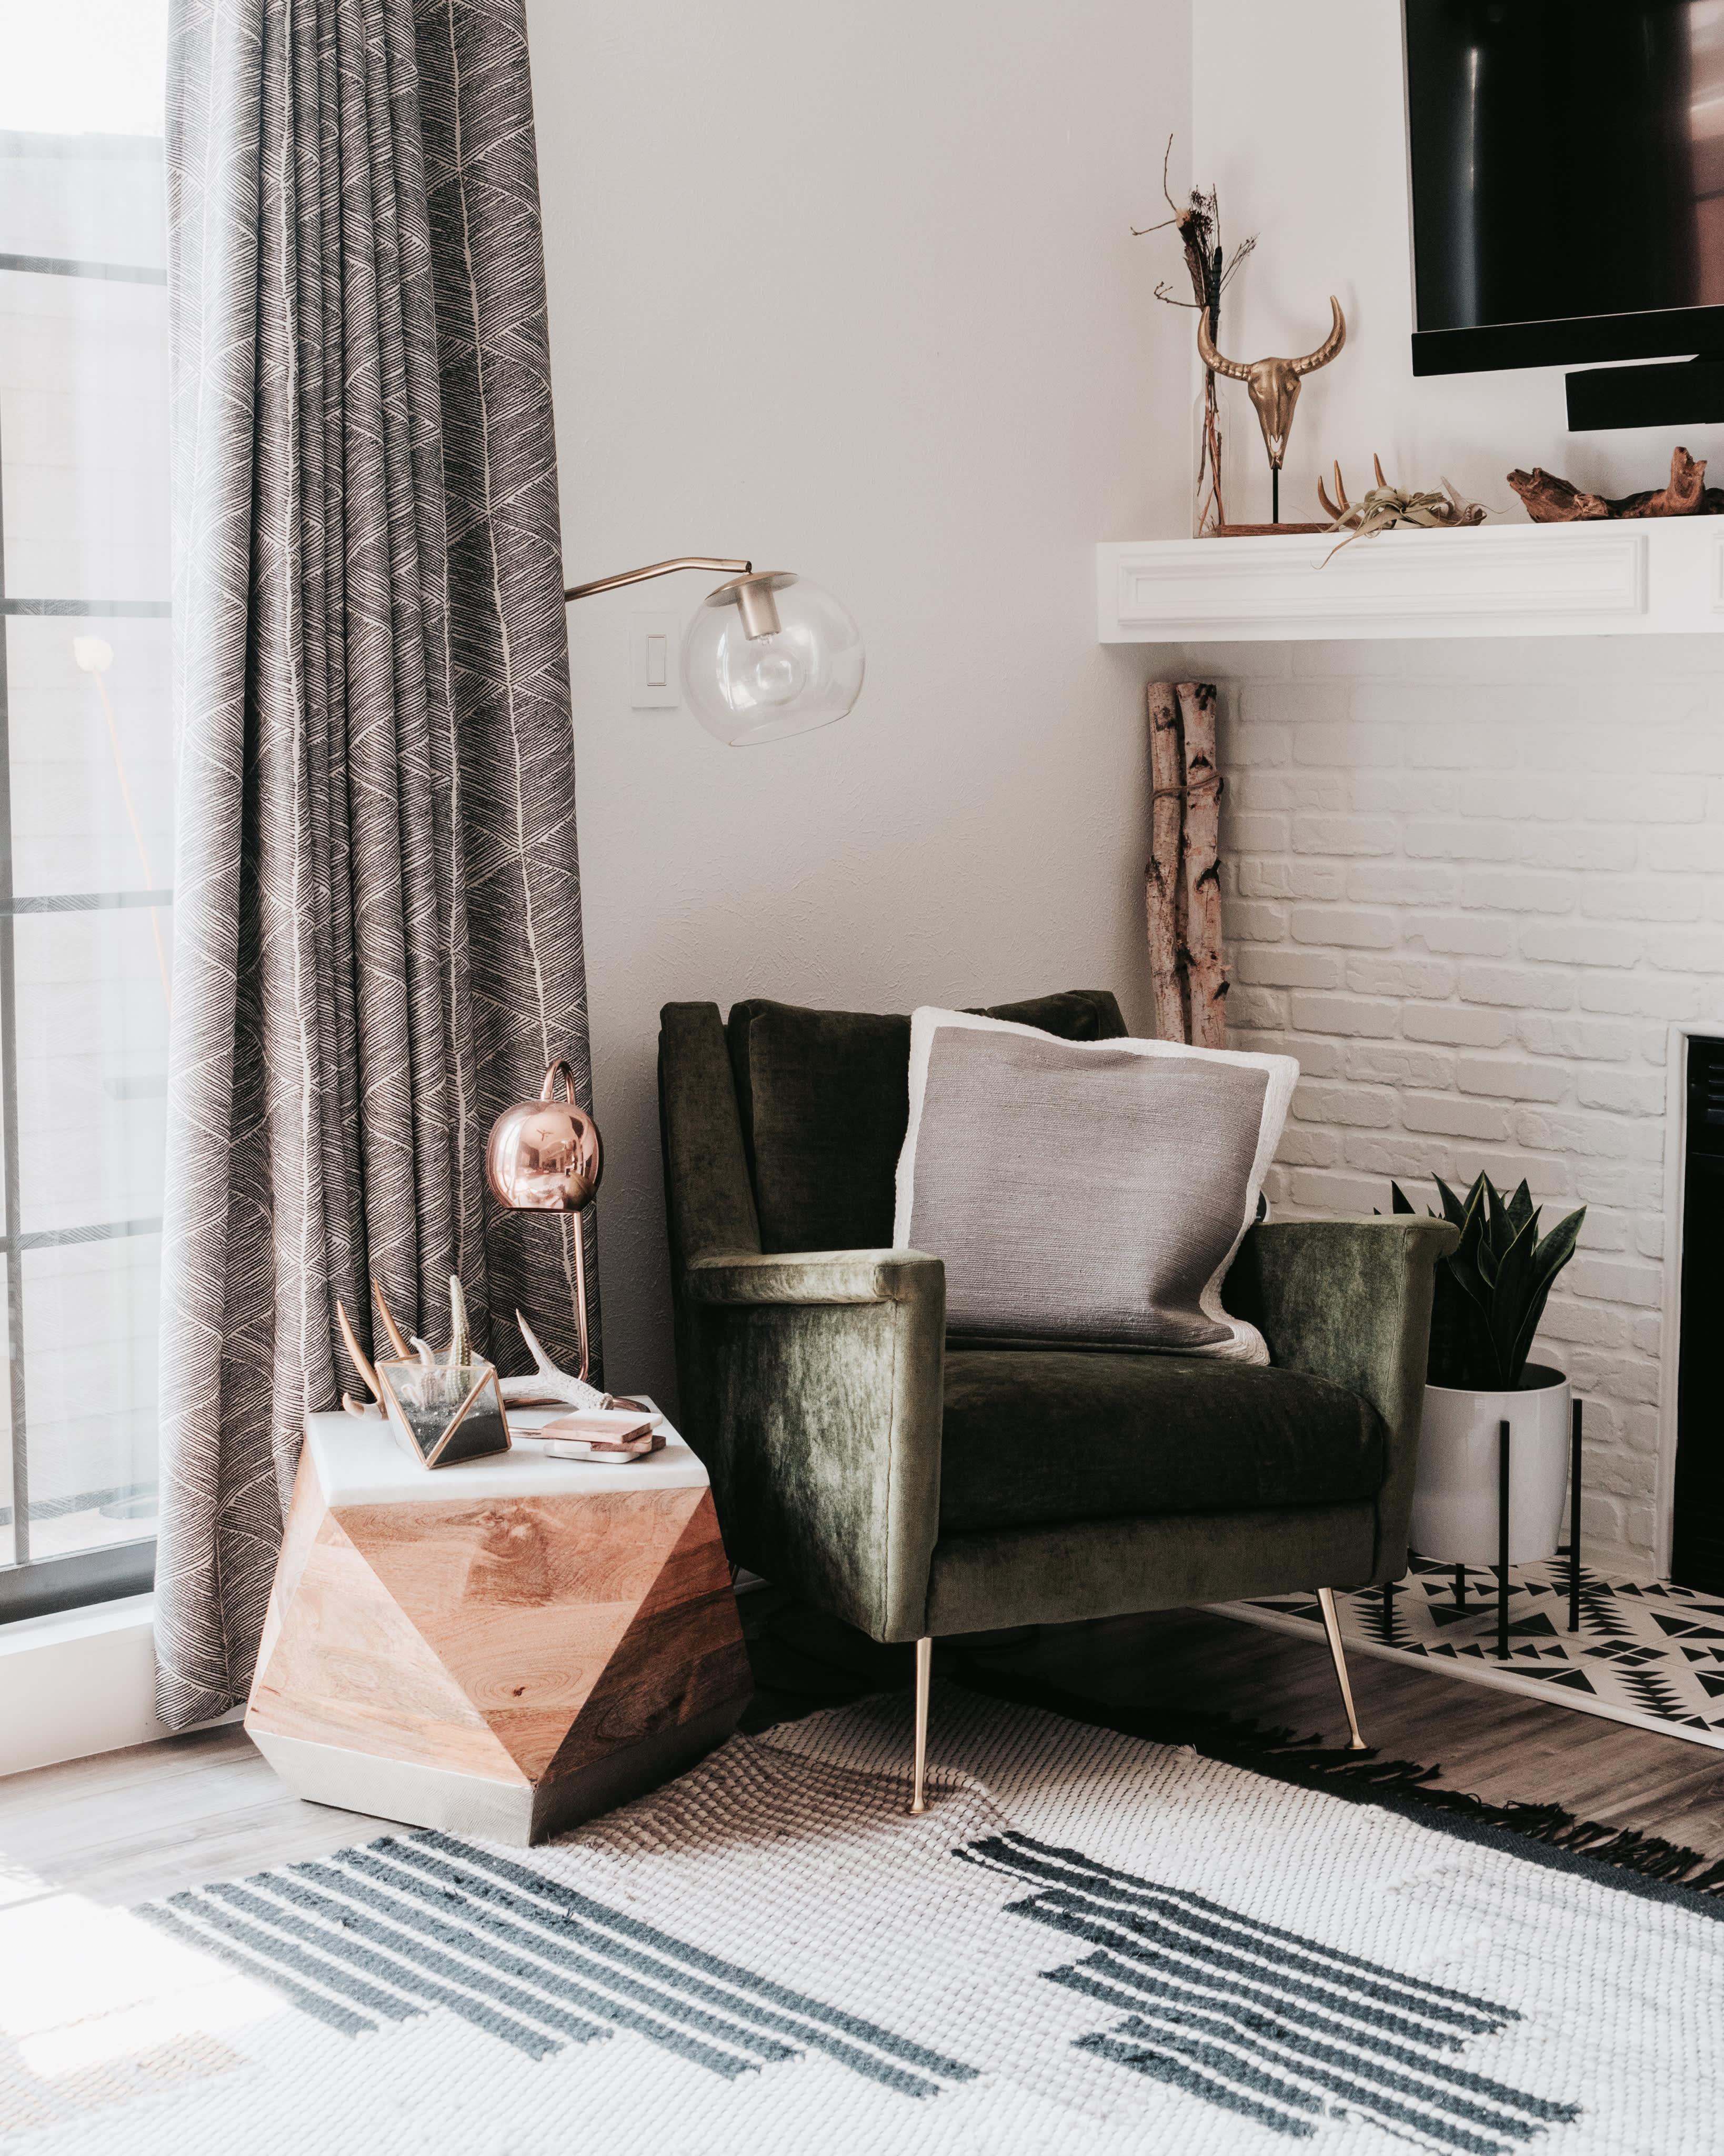 Scandinavian Minimal Bohemian Style Home | Apartment Therapy